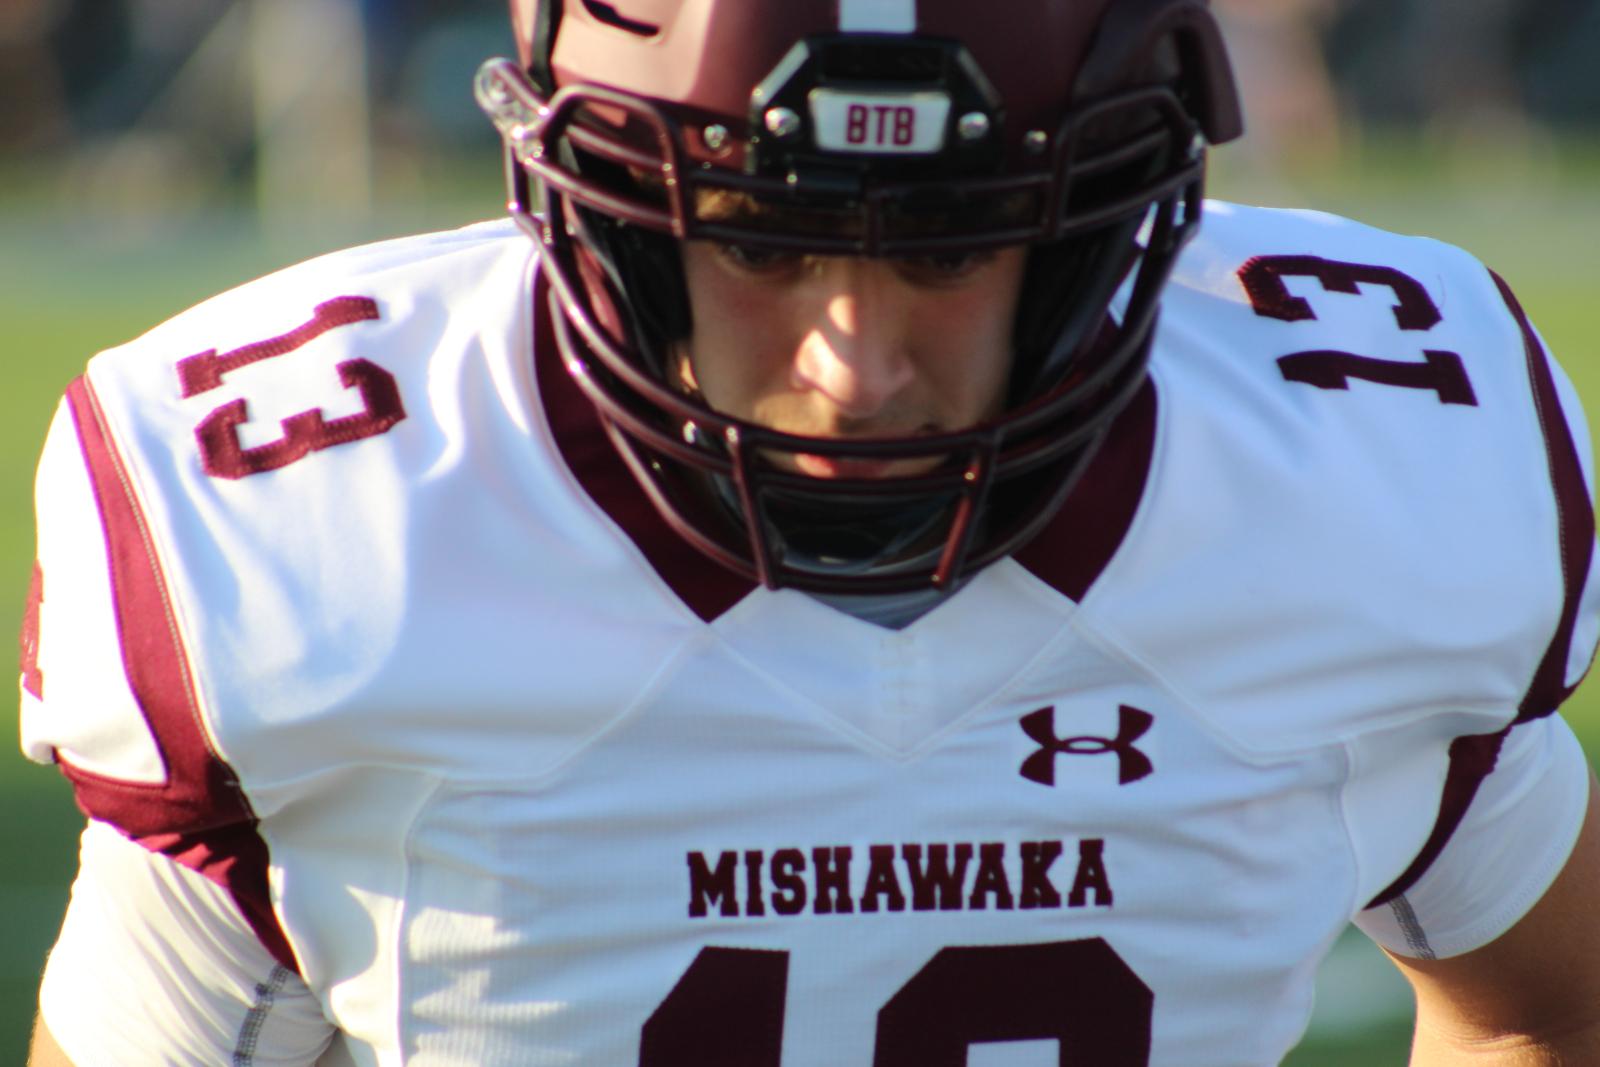 Mishawaka Coach Keith Kinder Previews Plymouth Game